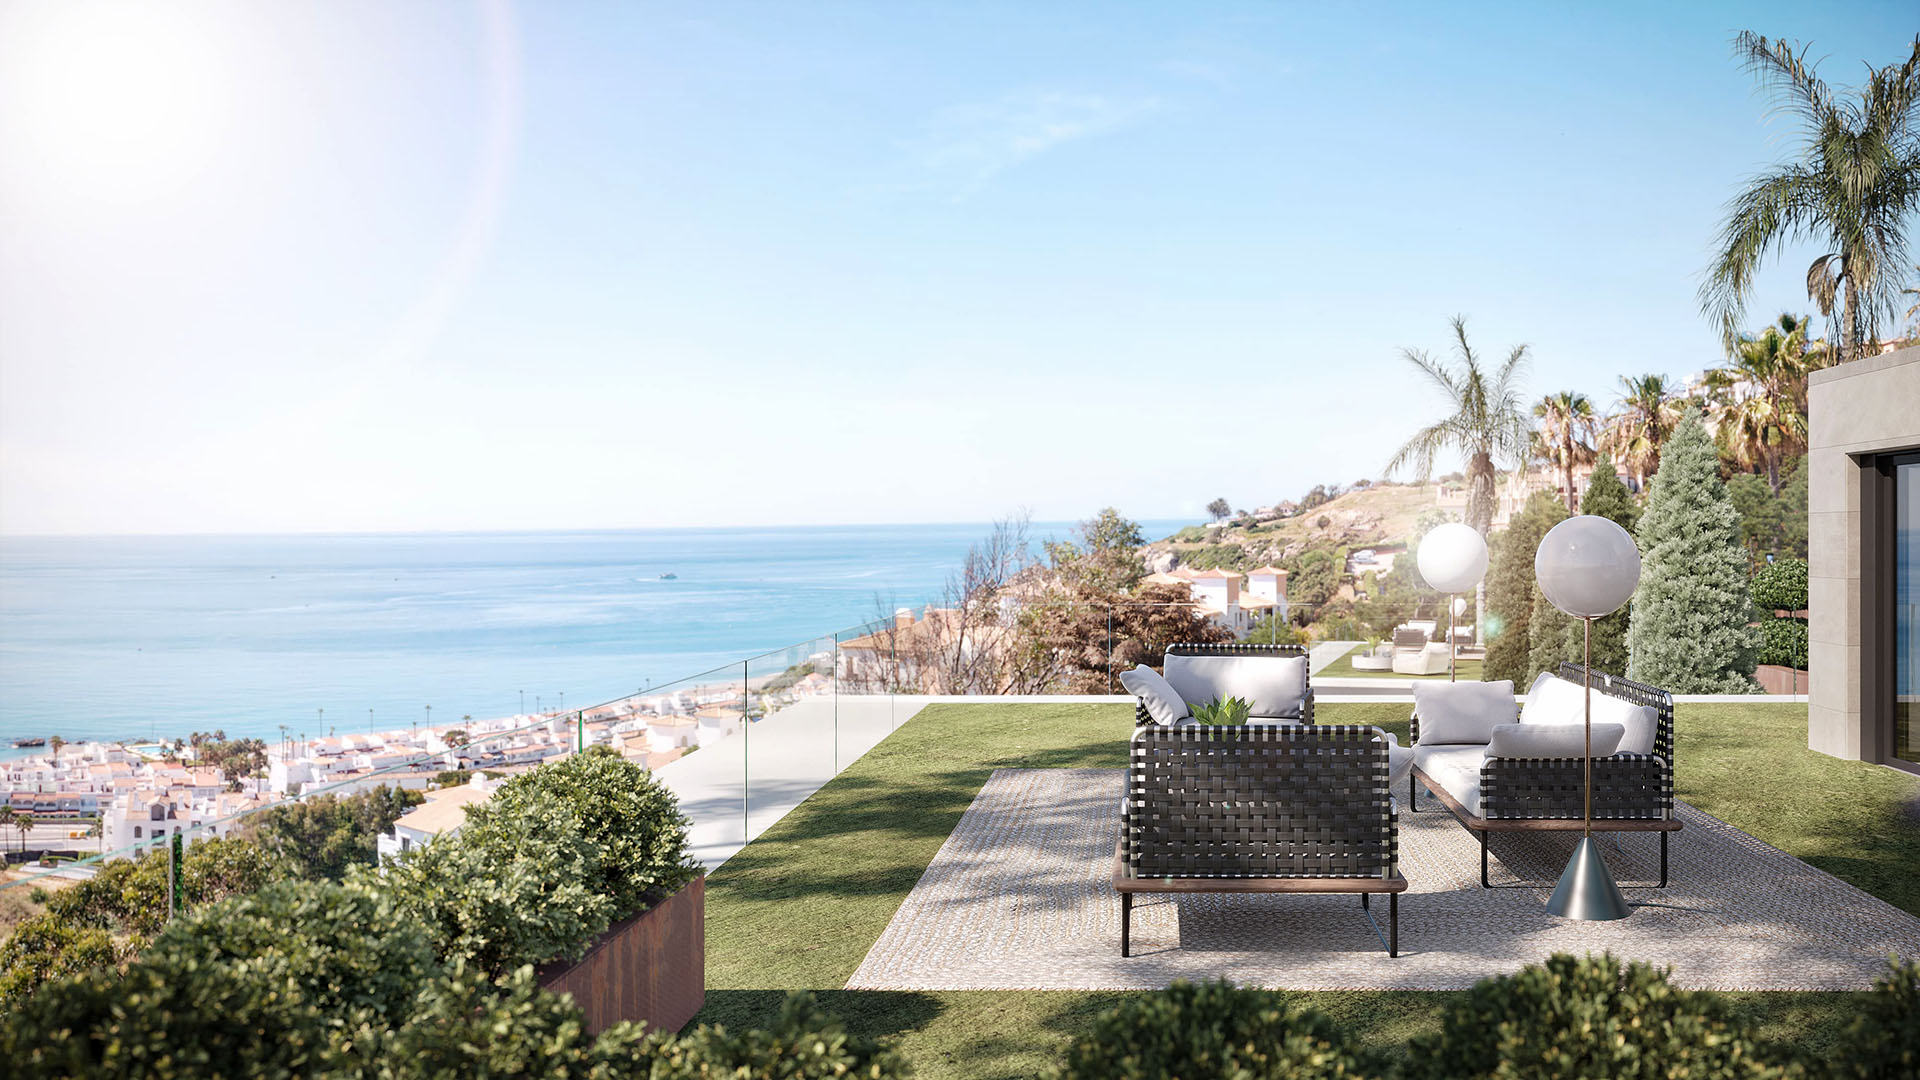 Ocean Eye: Magnificent villa in Manilva with views of the Mediterranean Sea